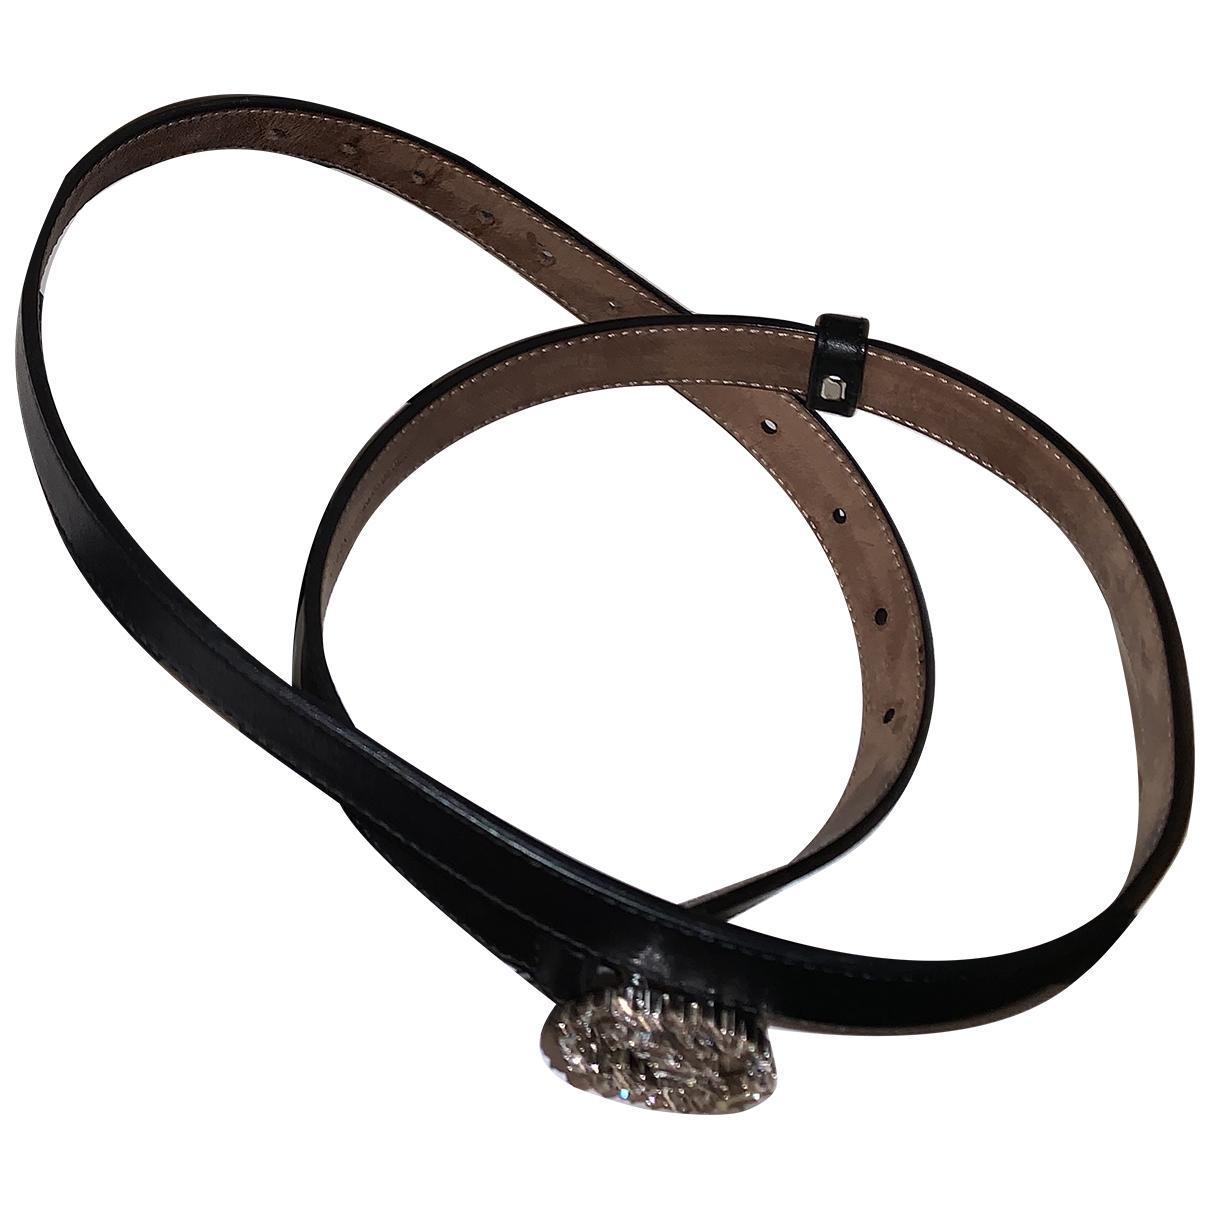 Gucci Interlocking Buckle Black Leather belt for Women 75 cm